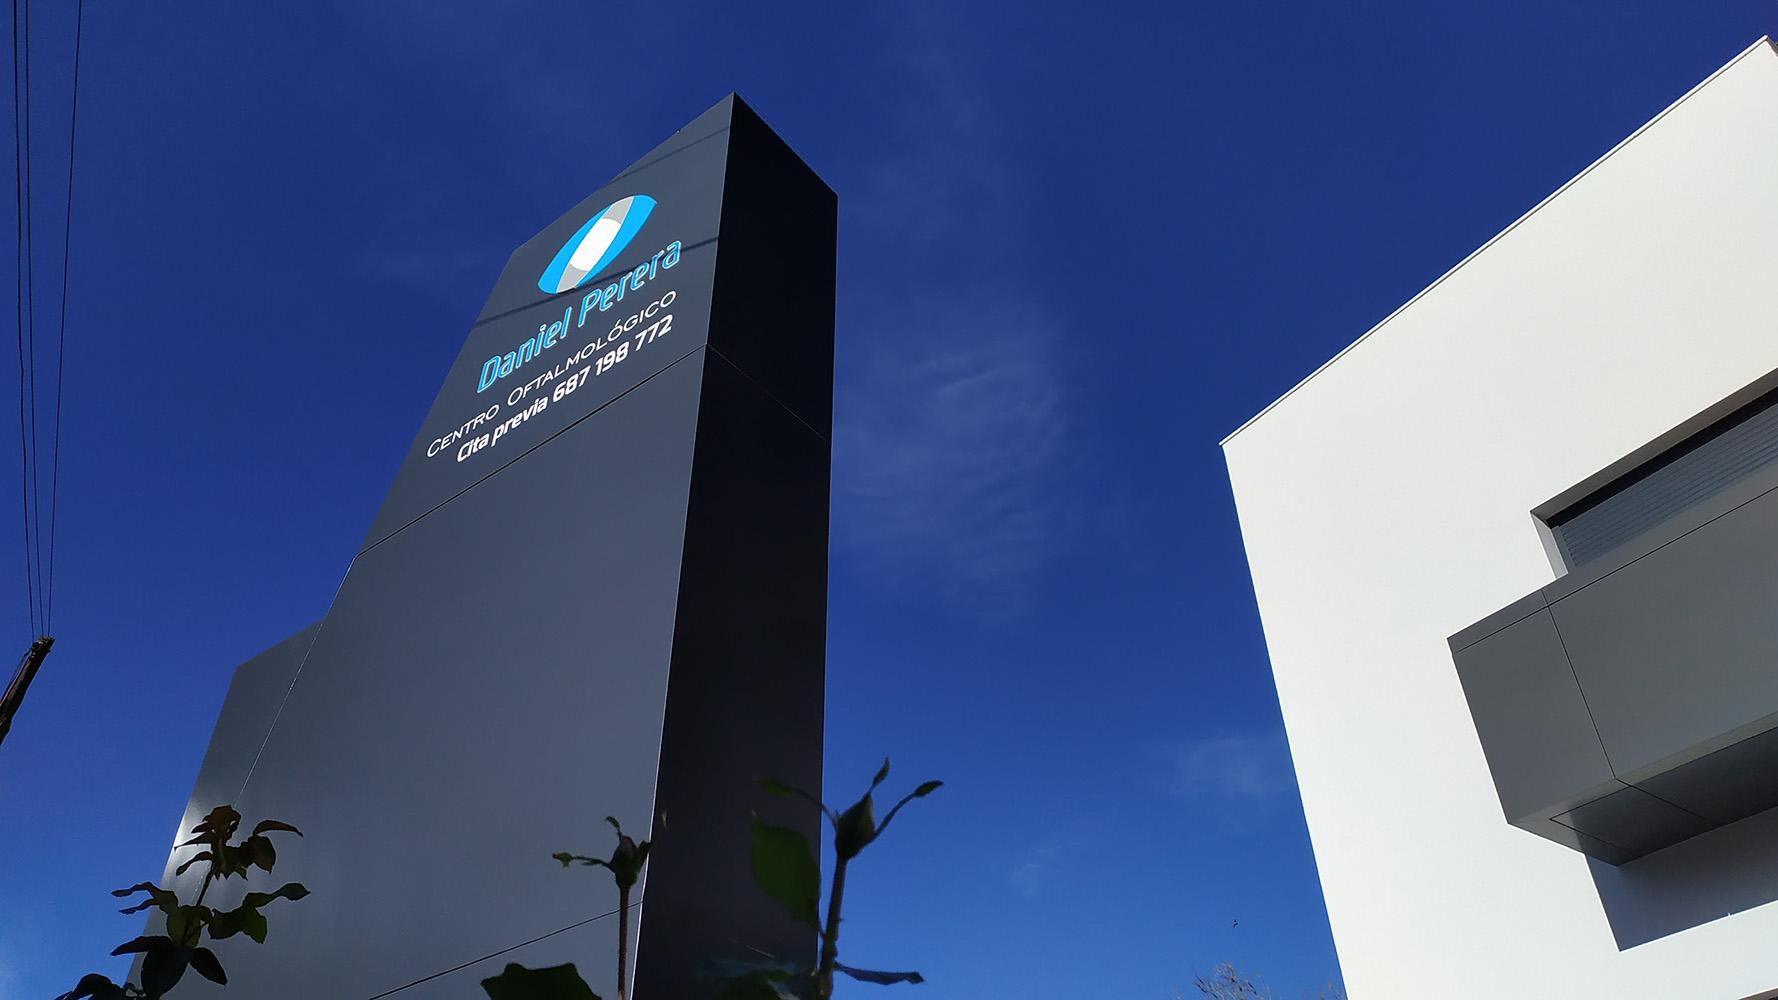 Daniel Perera Centro Oftalmológico – Tótem Luminoso, Rótulo Luminoso, Led Profile